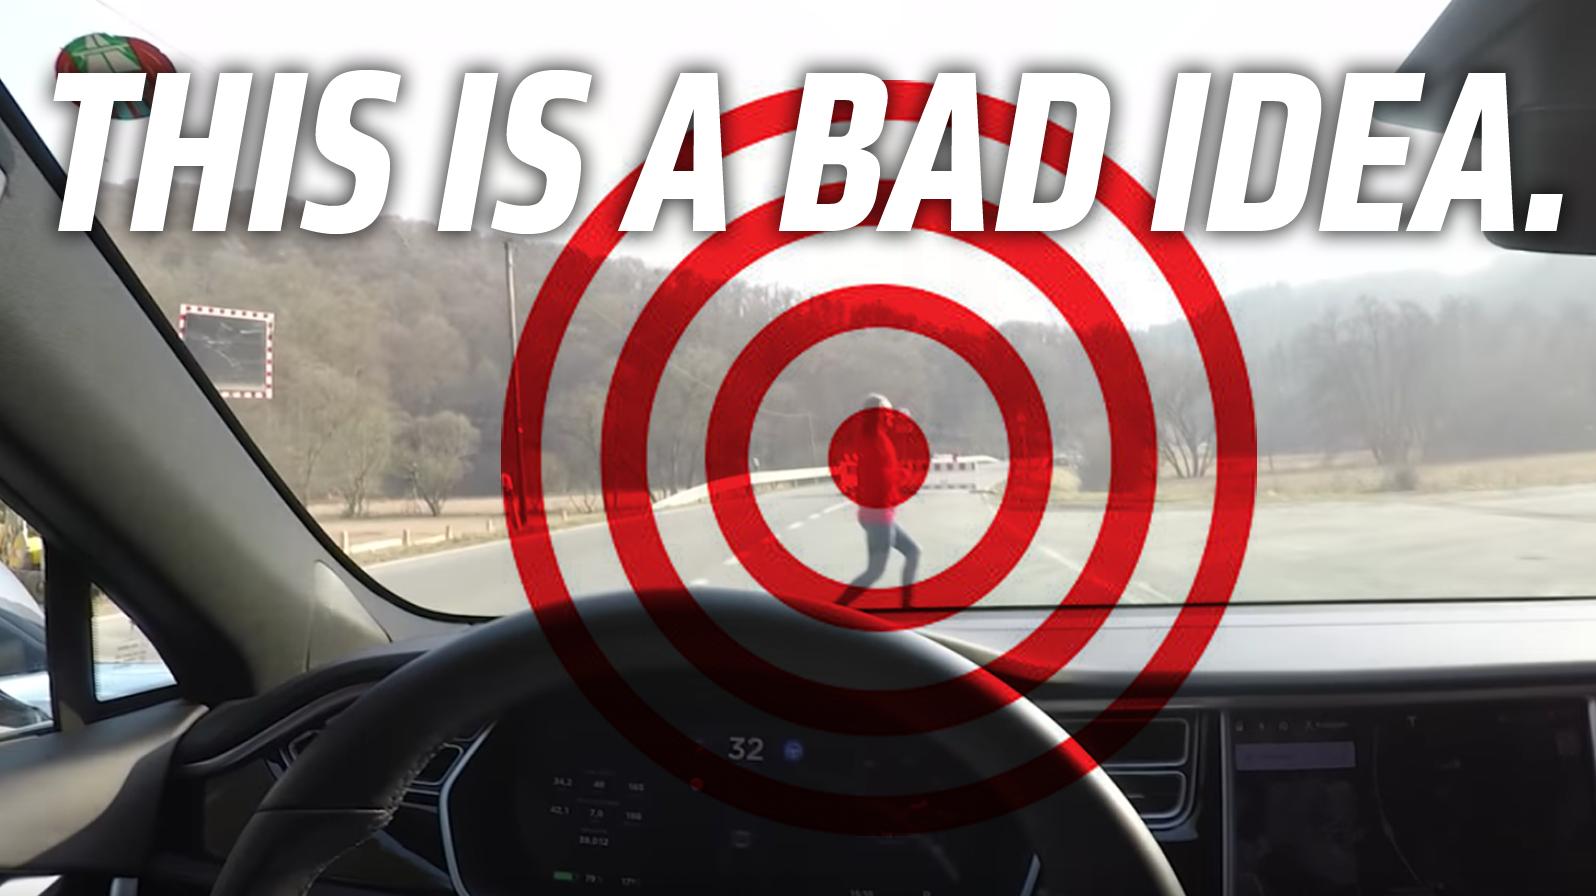 autopilot emergency-braking jalopnik tesla